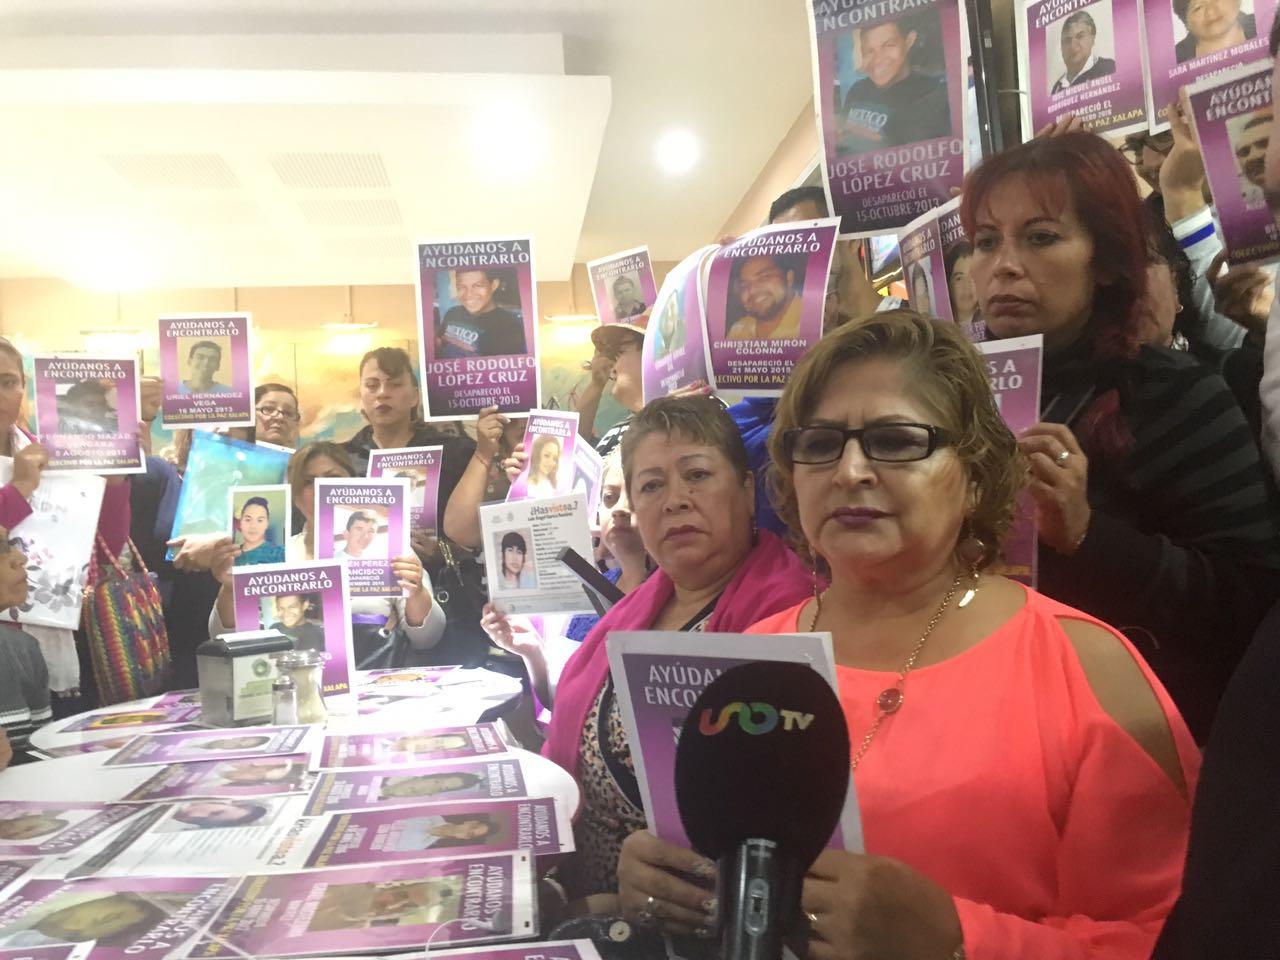 Colectivo denunciará a Duarte y Bermúdez por desaparición forzada